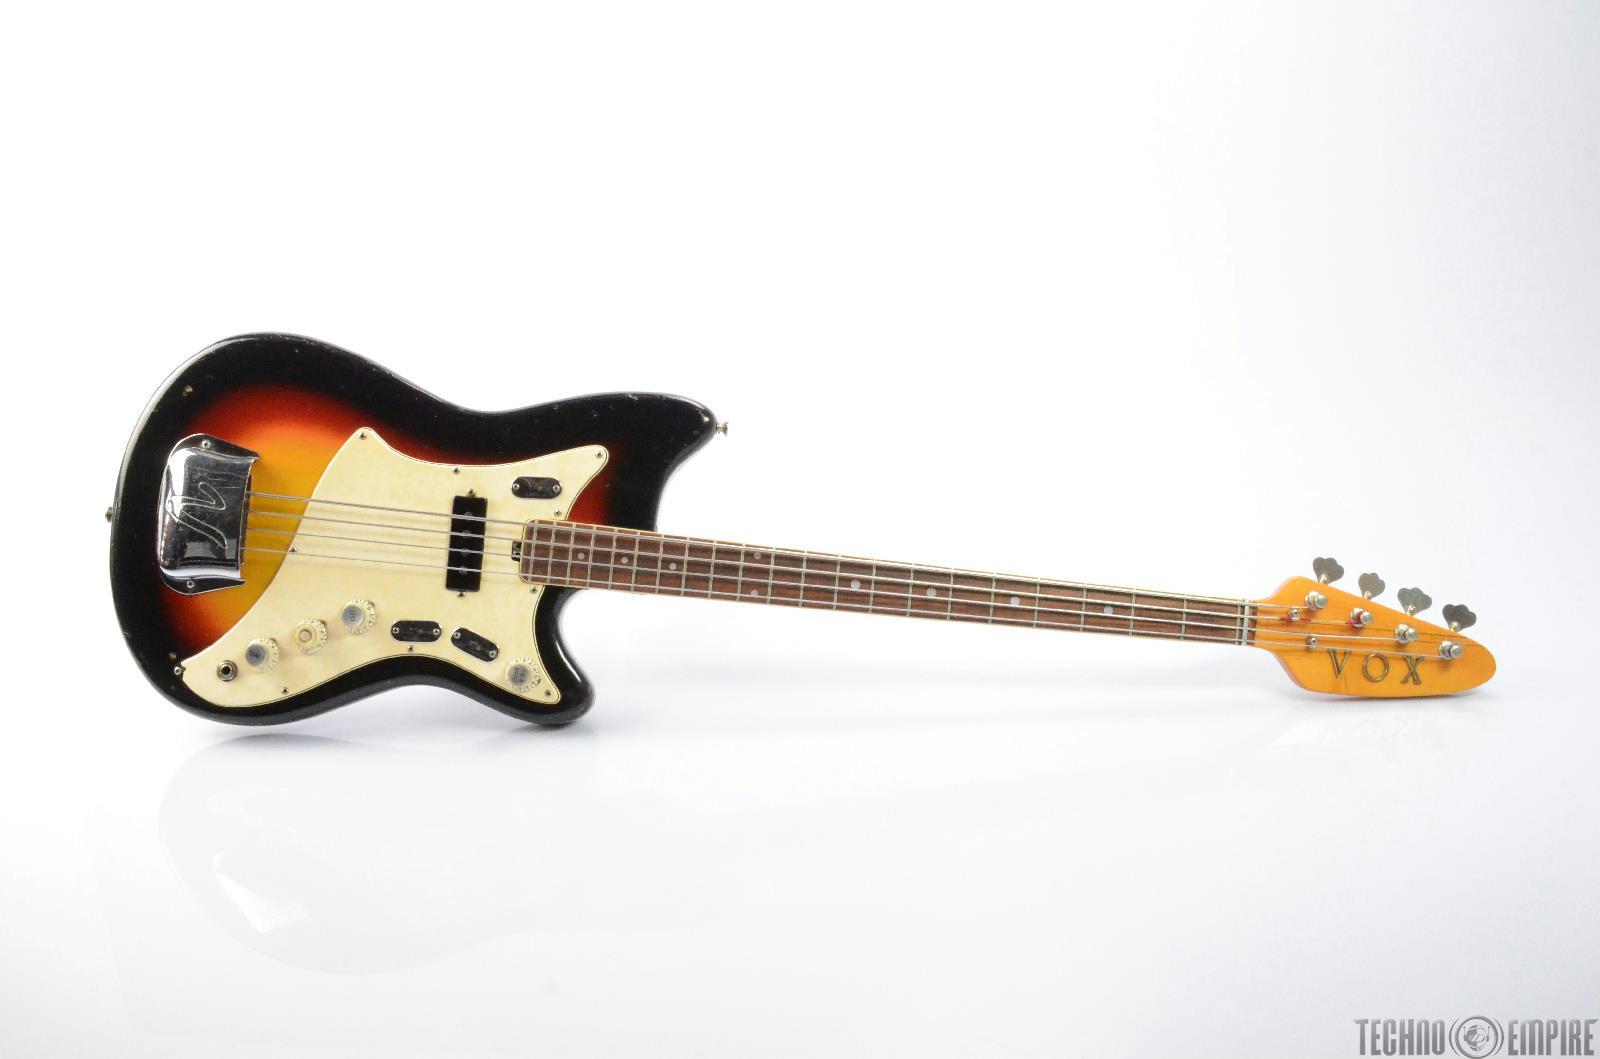 1968 VOX V263 Hawk IV Electric Bass Guitar w/ Carrying Bag #26423